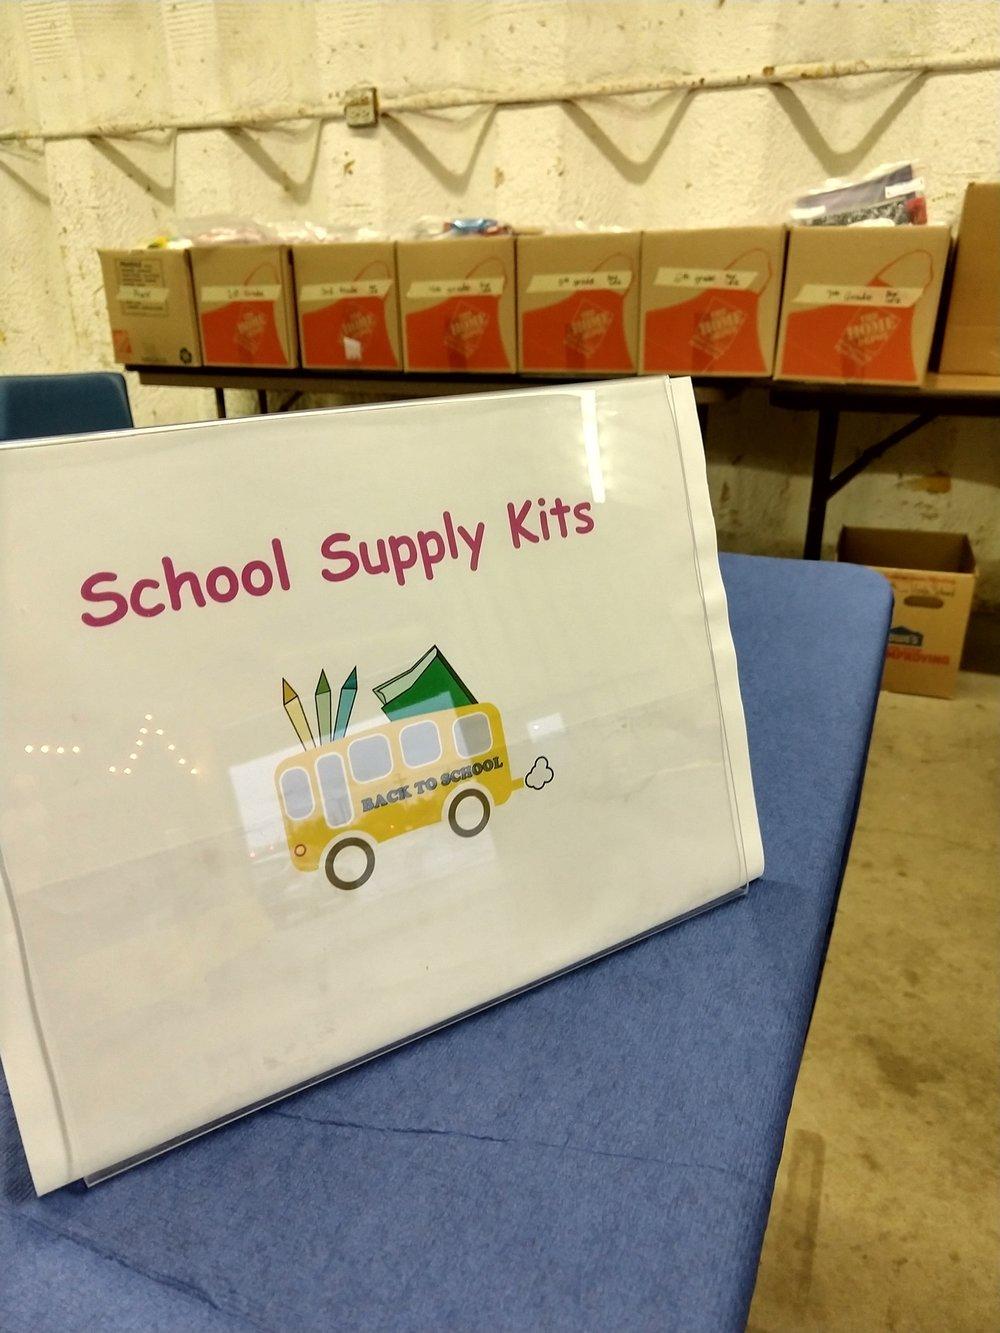 School Supply Kit Sign.jpg